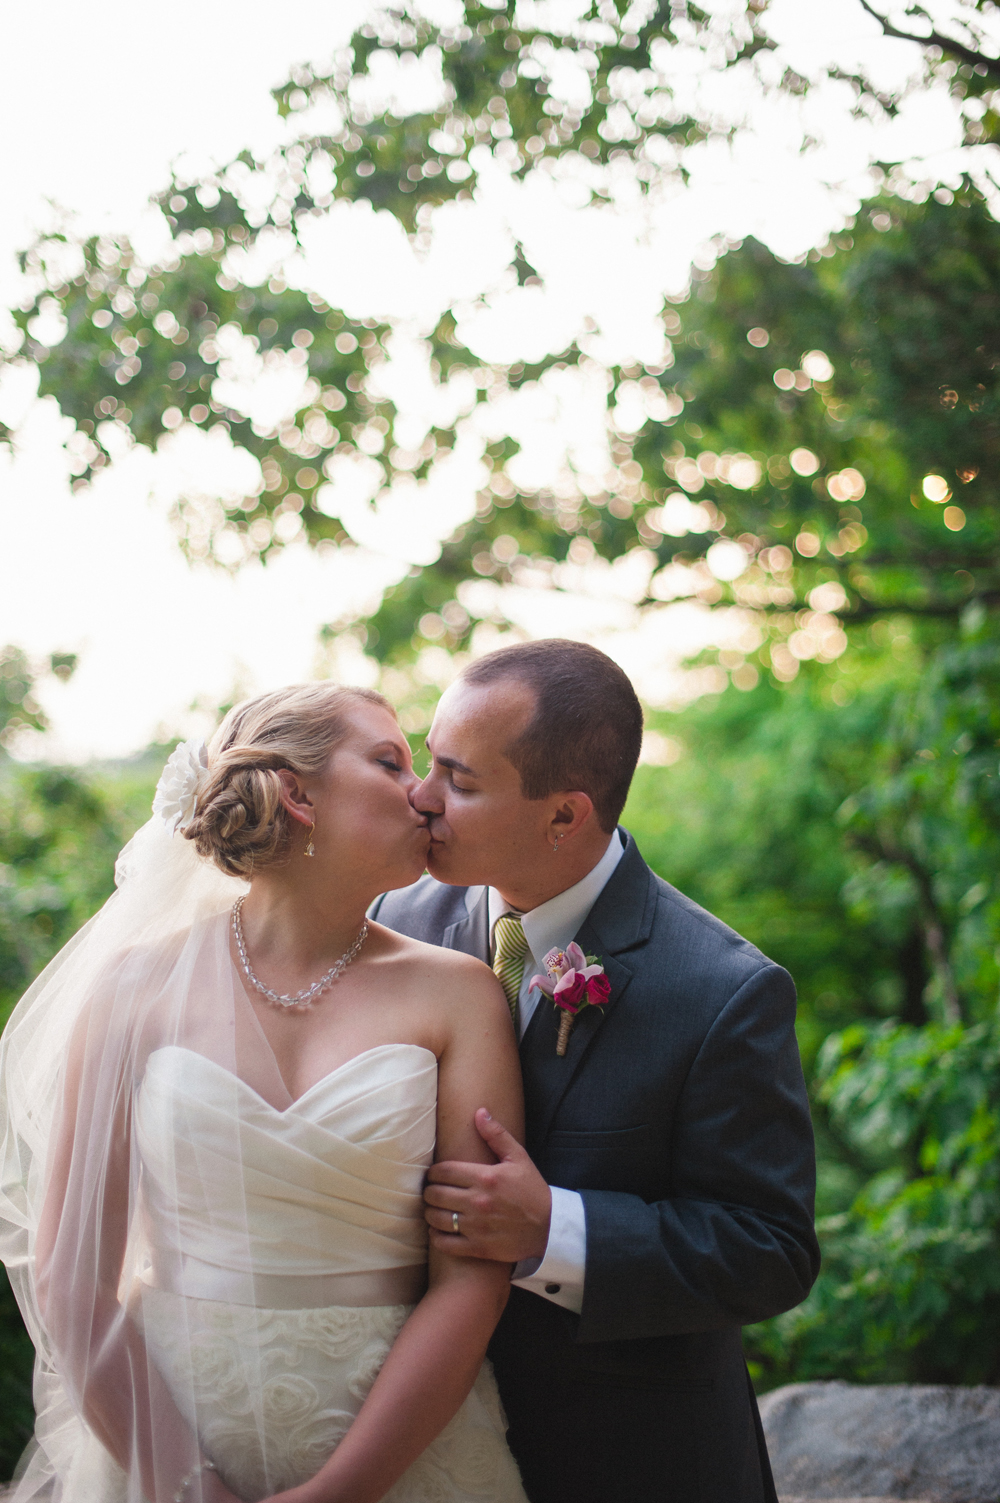 Tarrywile-Mansion-Wedding-Greg-Lewis-Photo-74